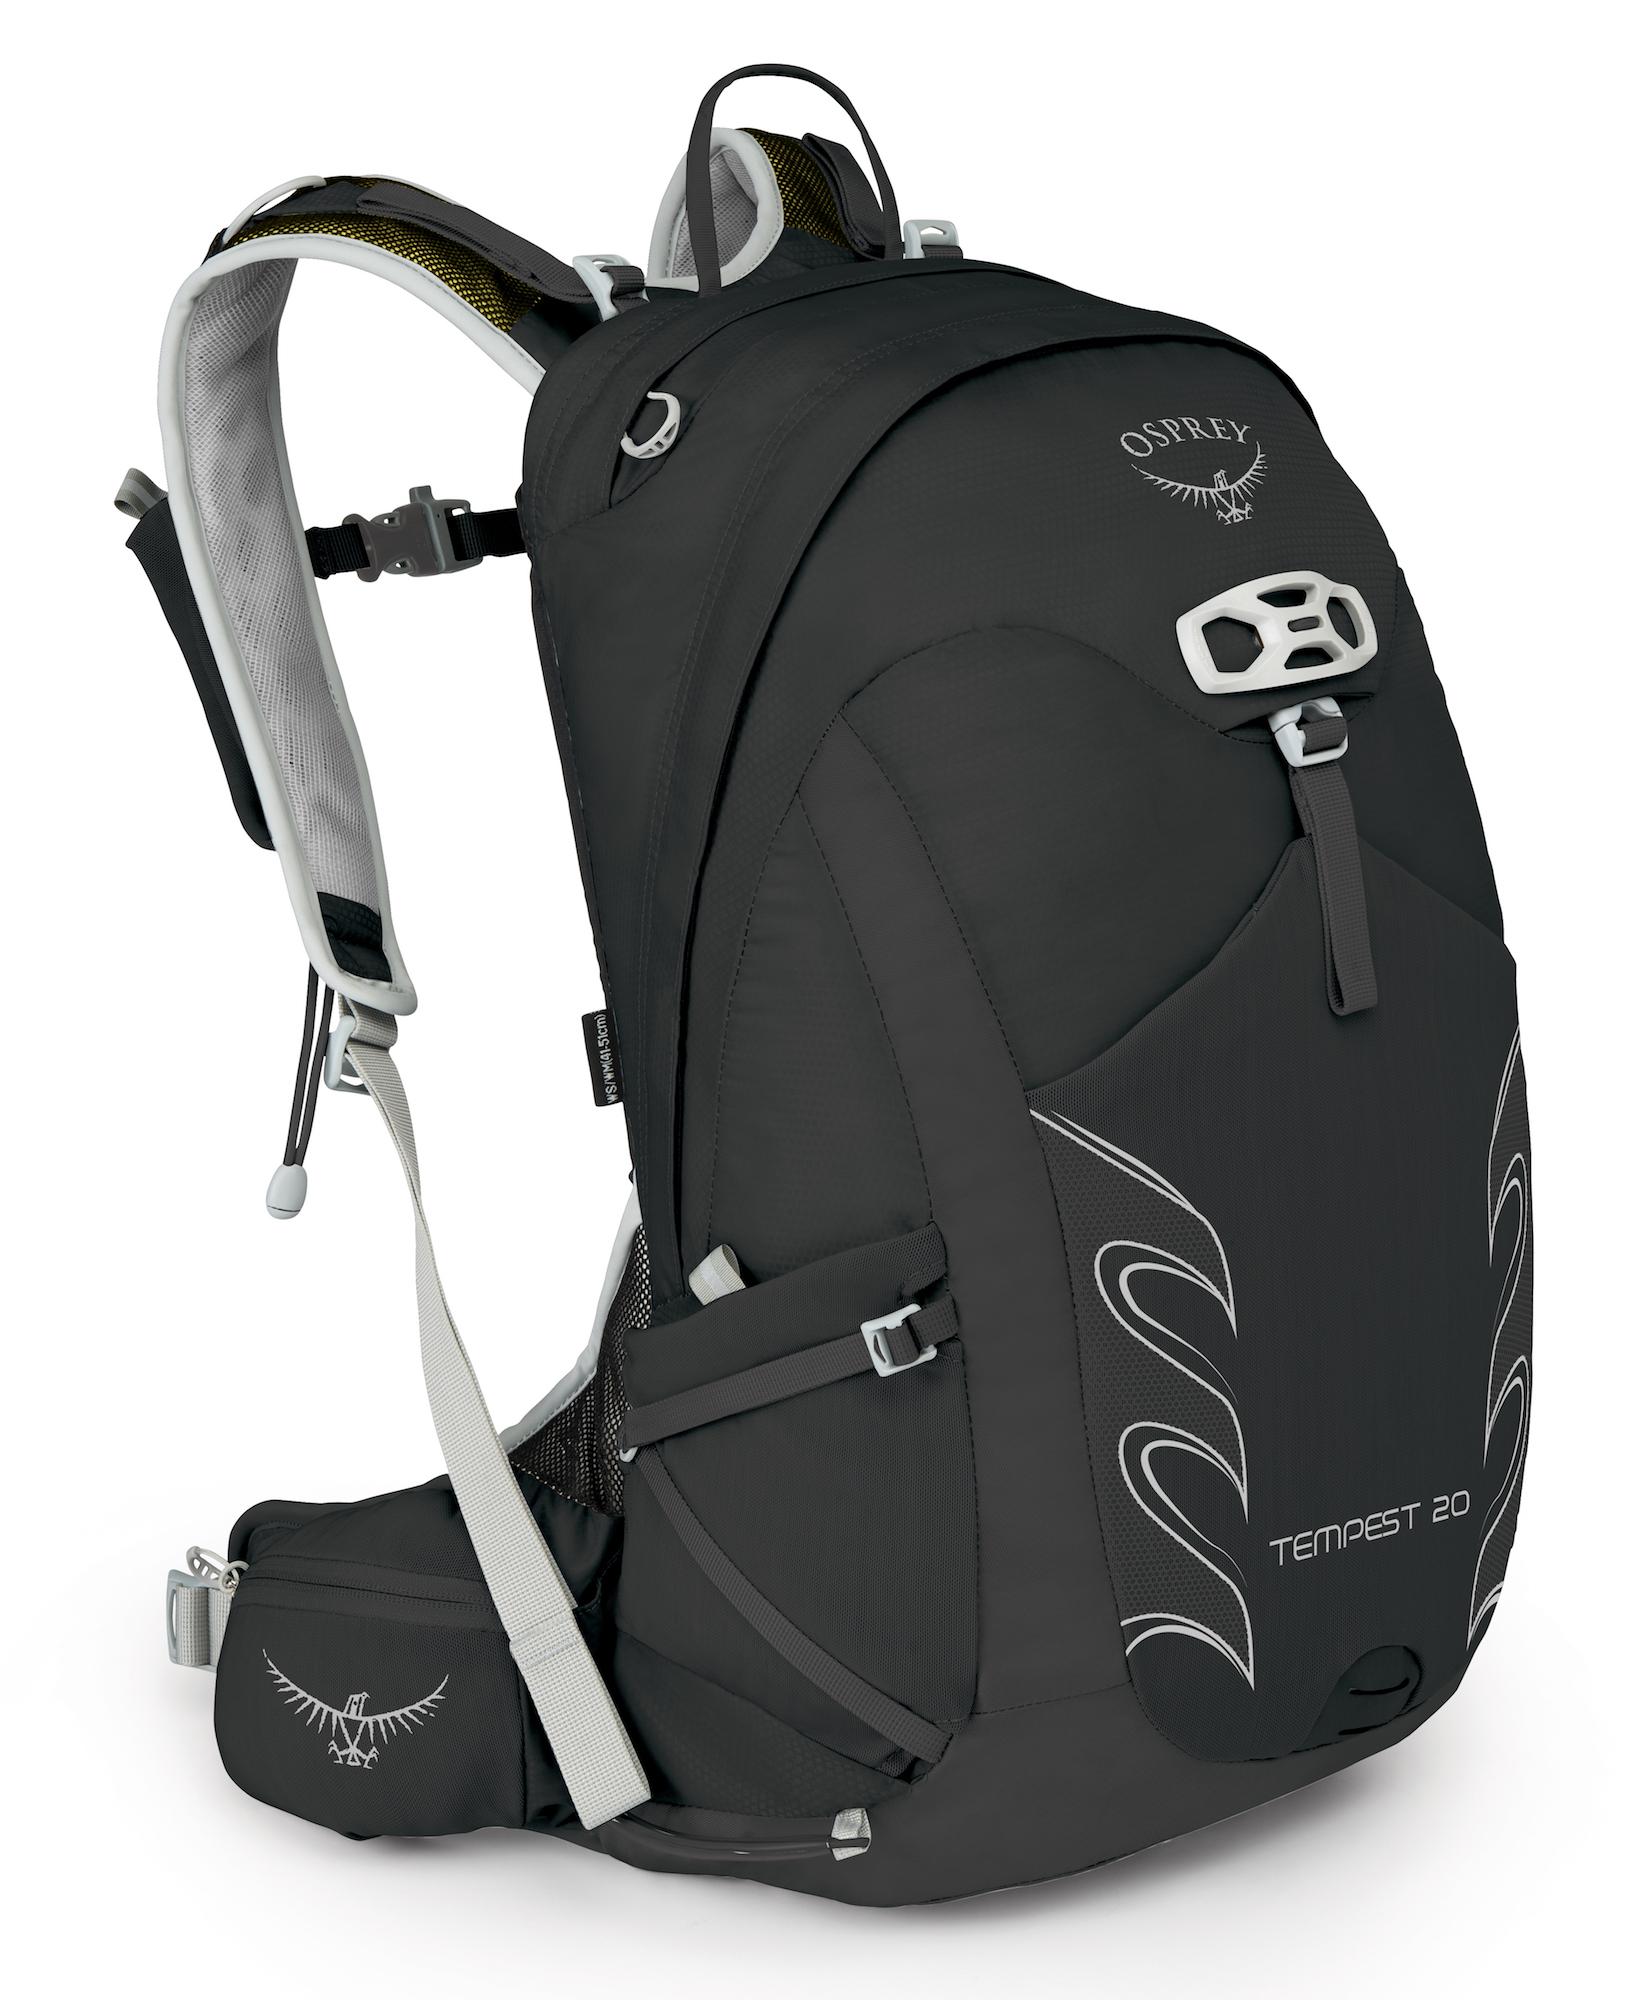 Osprey - Tempest 20 - Backpack - Women's